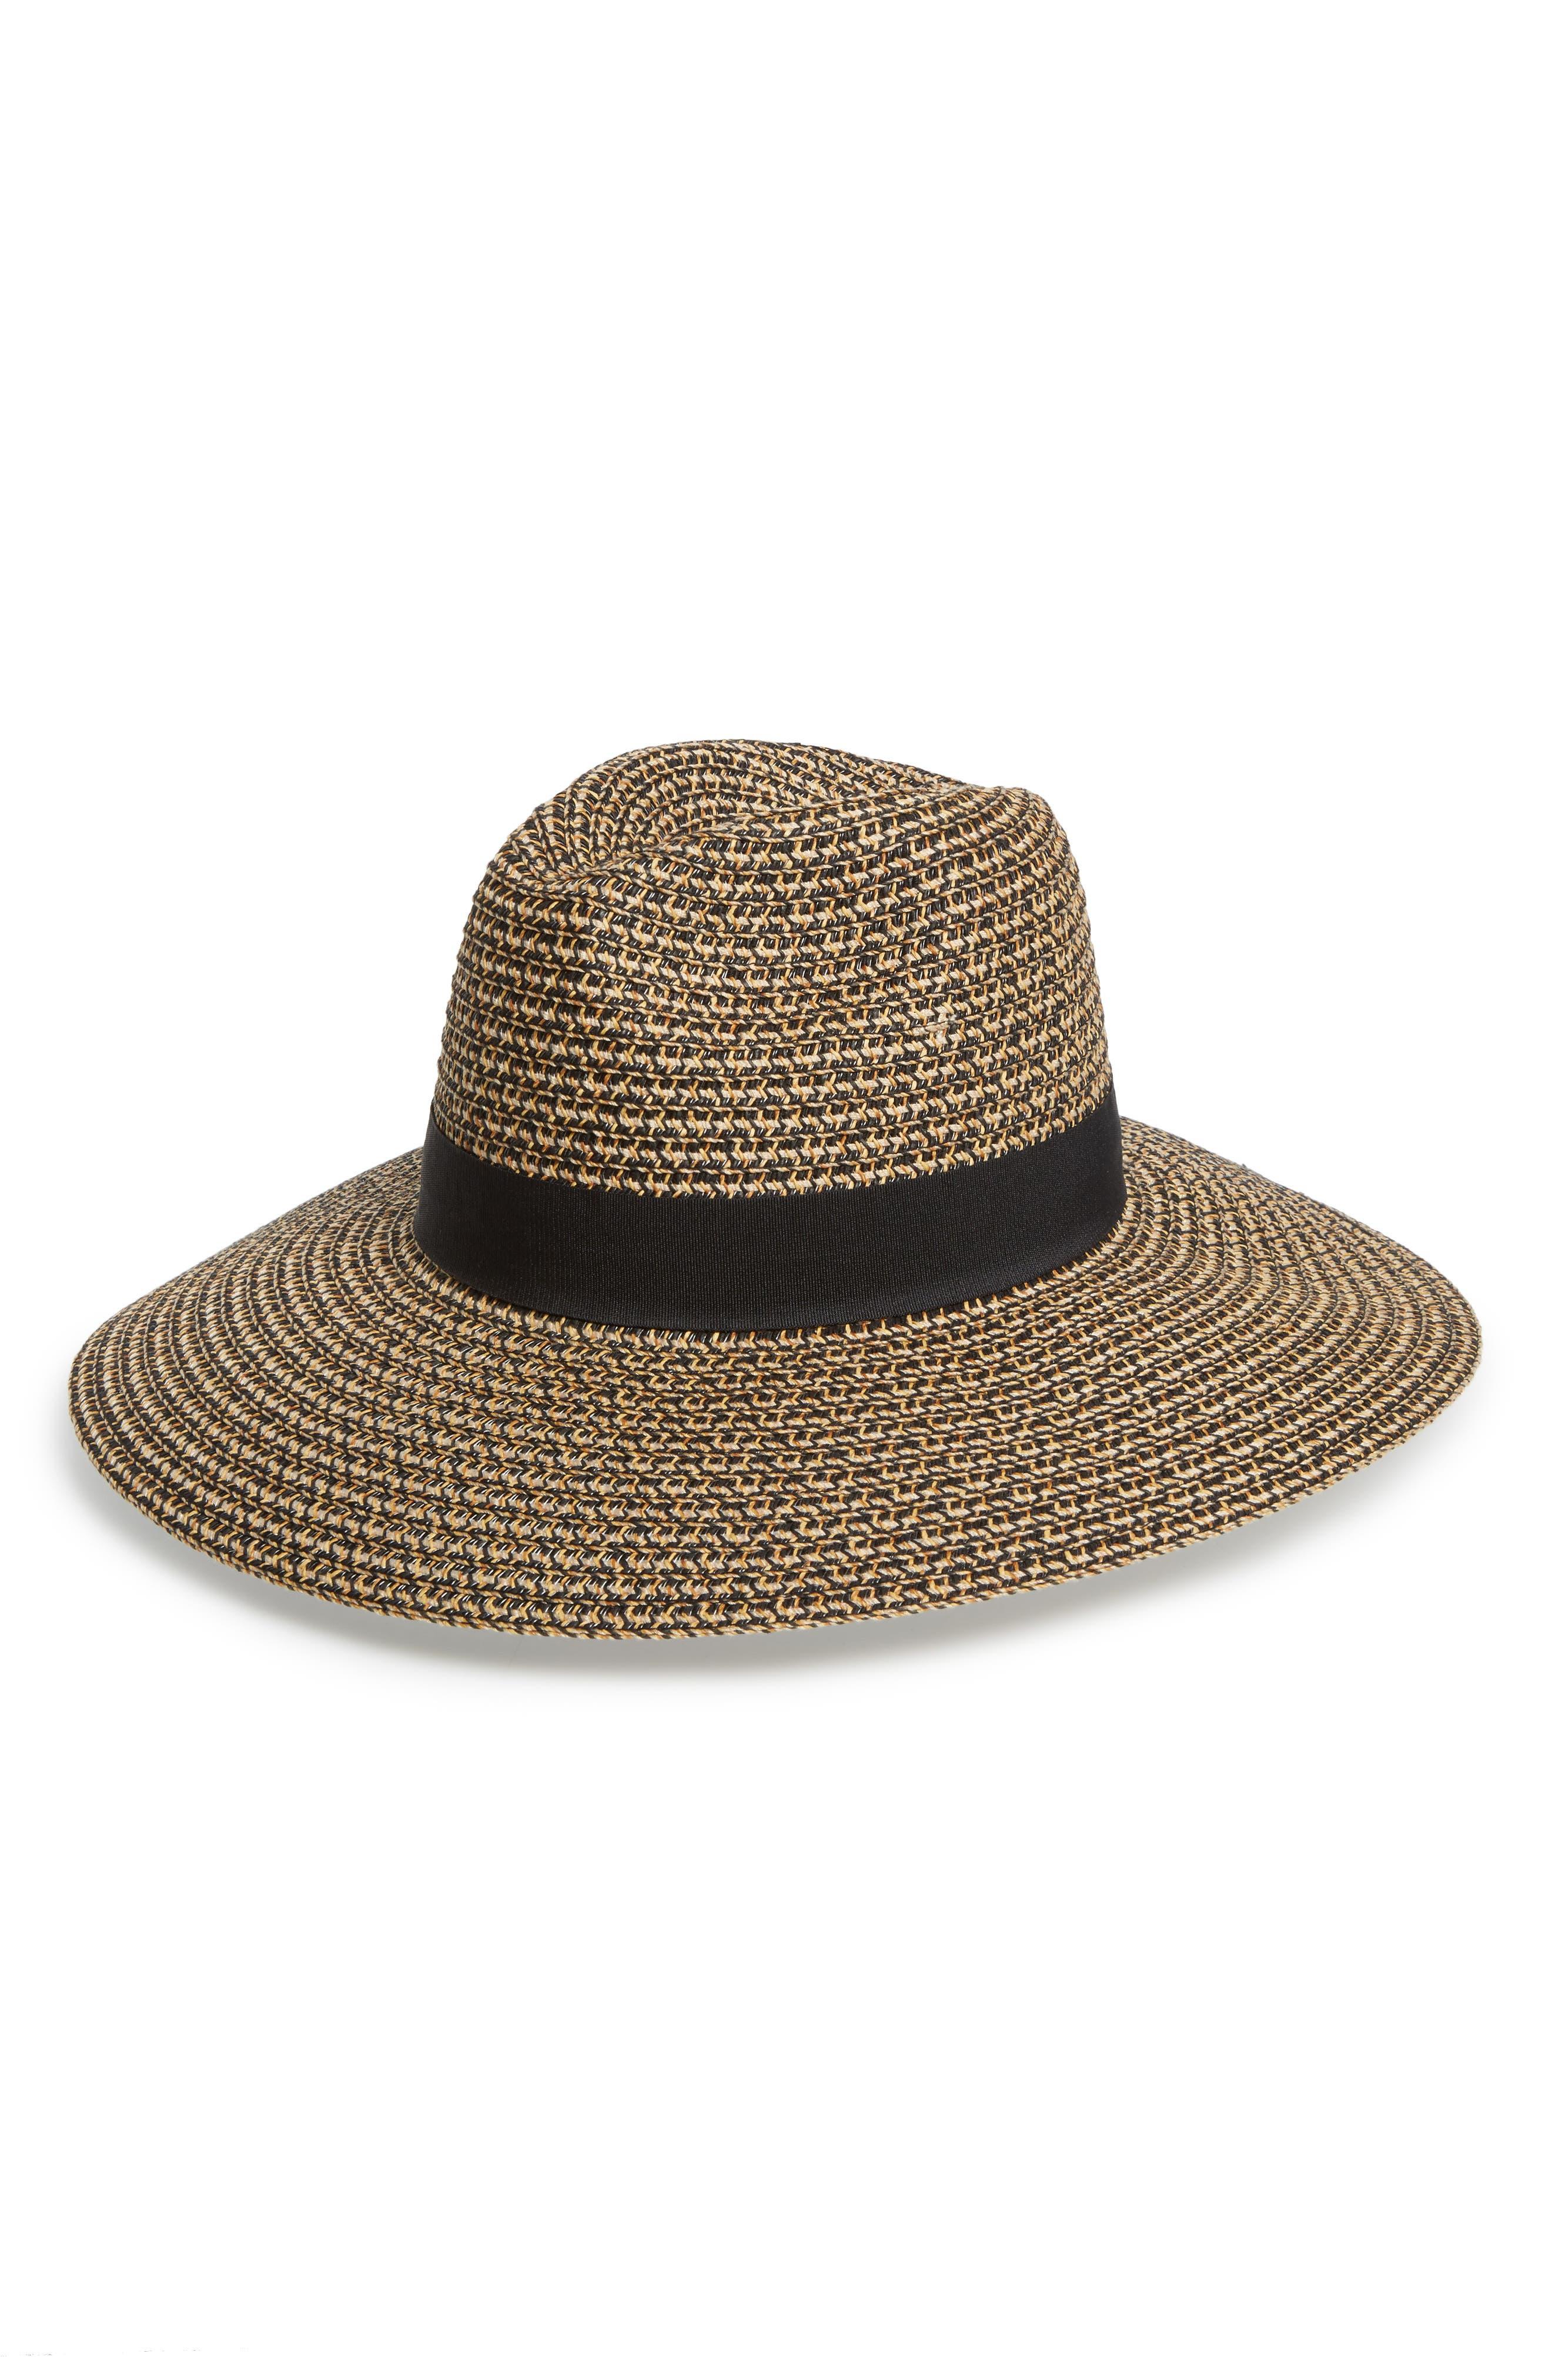 Woven Straw Sun Hat,                         Main,                         color, 005